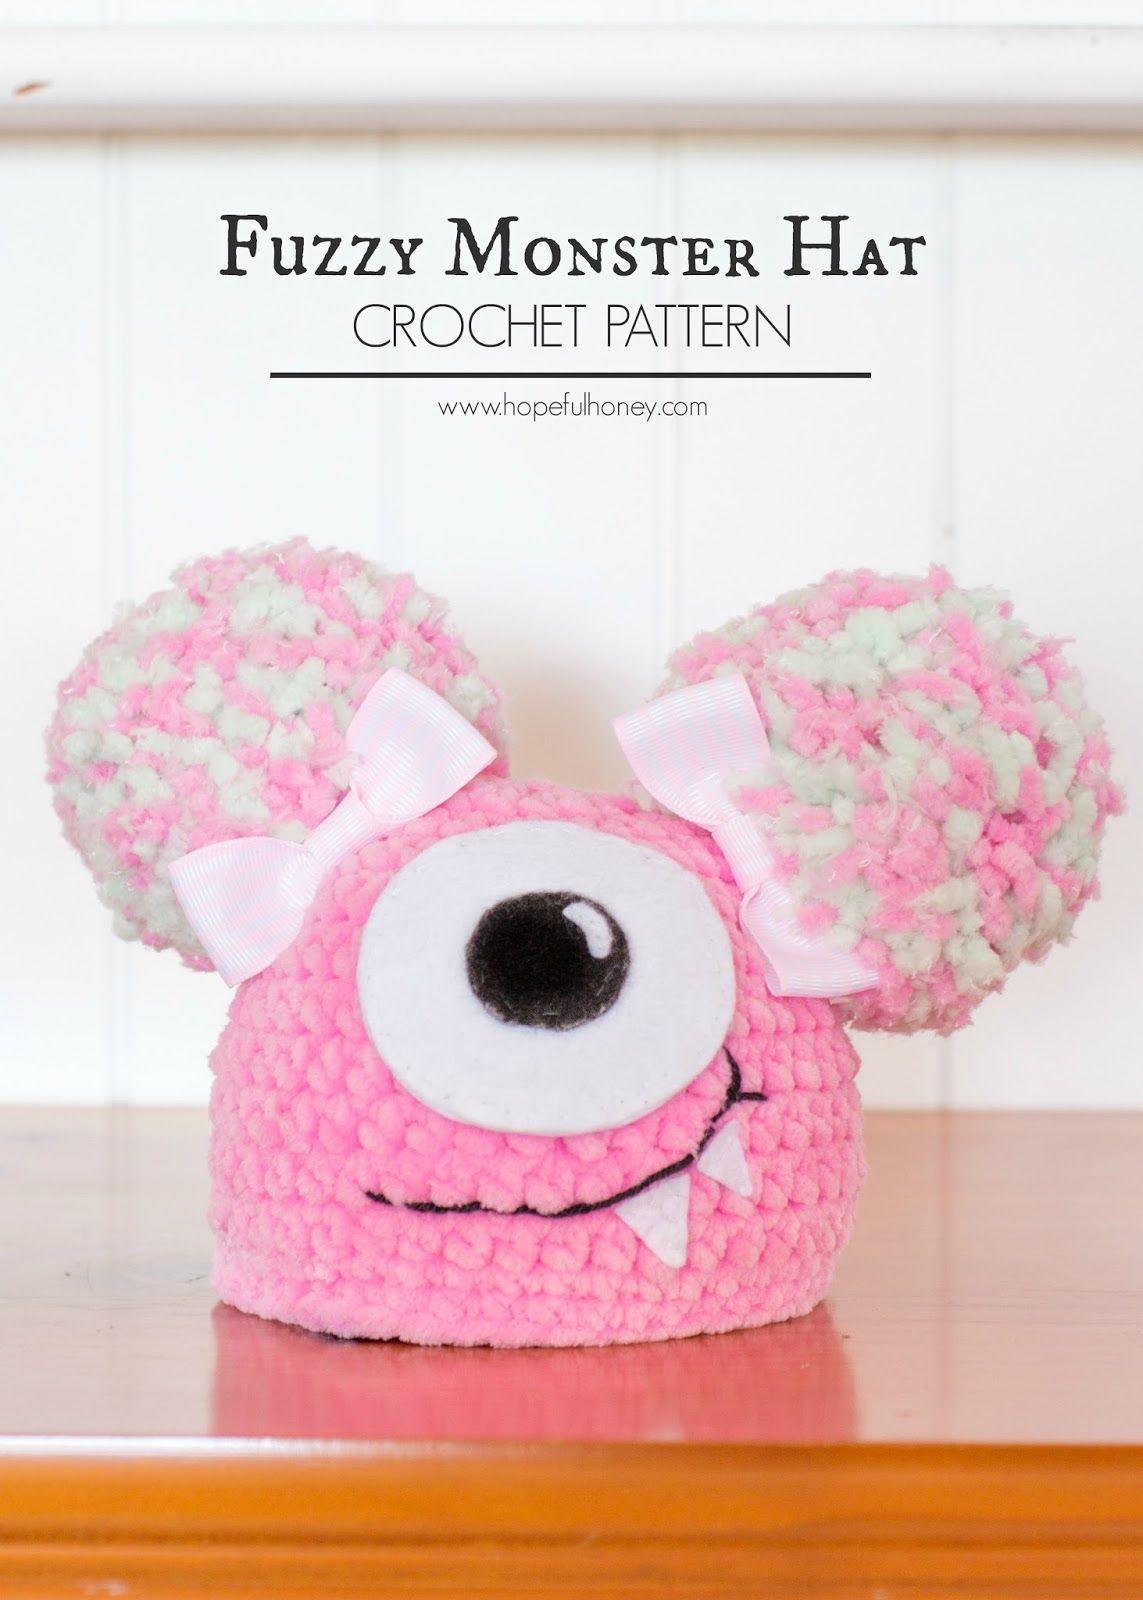 Newborn Fuzzy Monster Hat - Free Crochet Pattern | Monster hat, Free ...